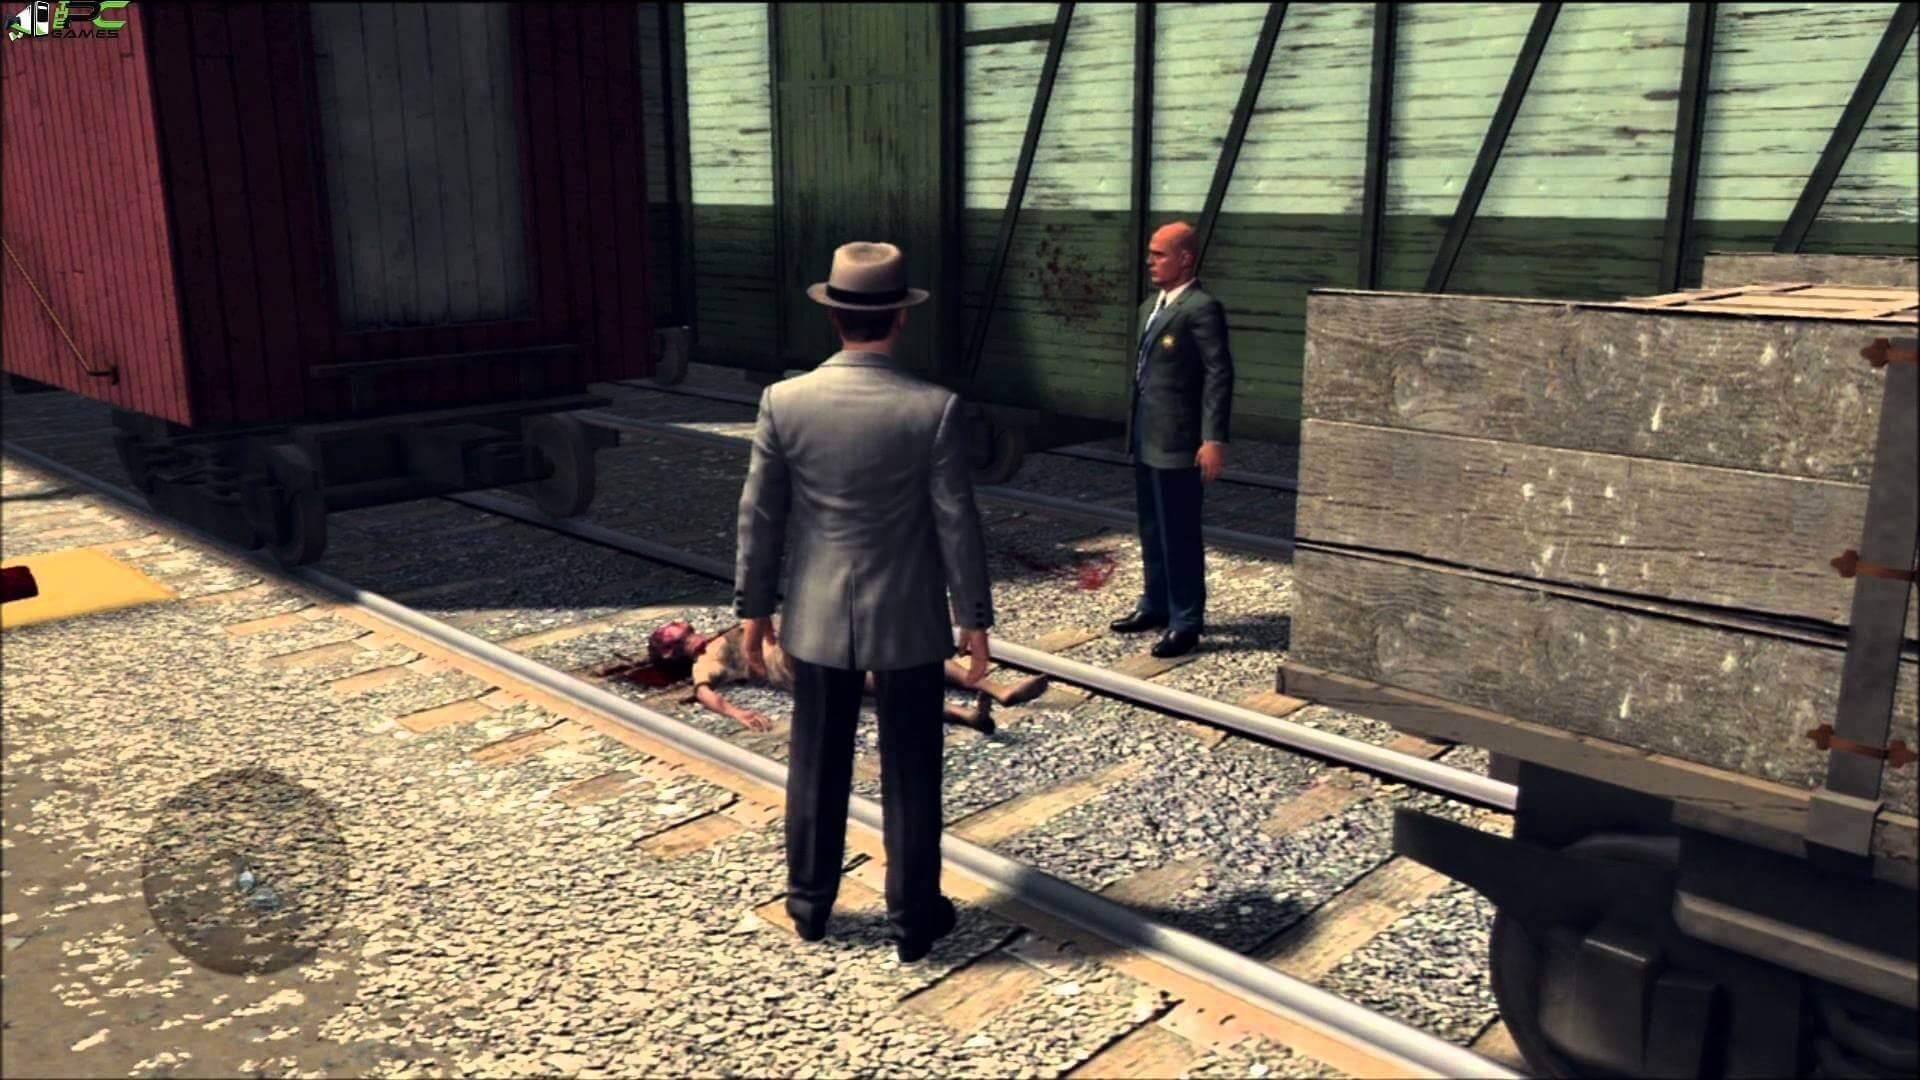 L.A. Noire MacBook OS X Version gameplay